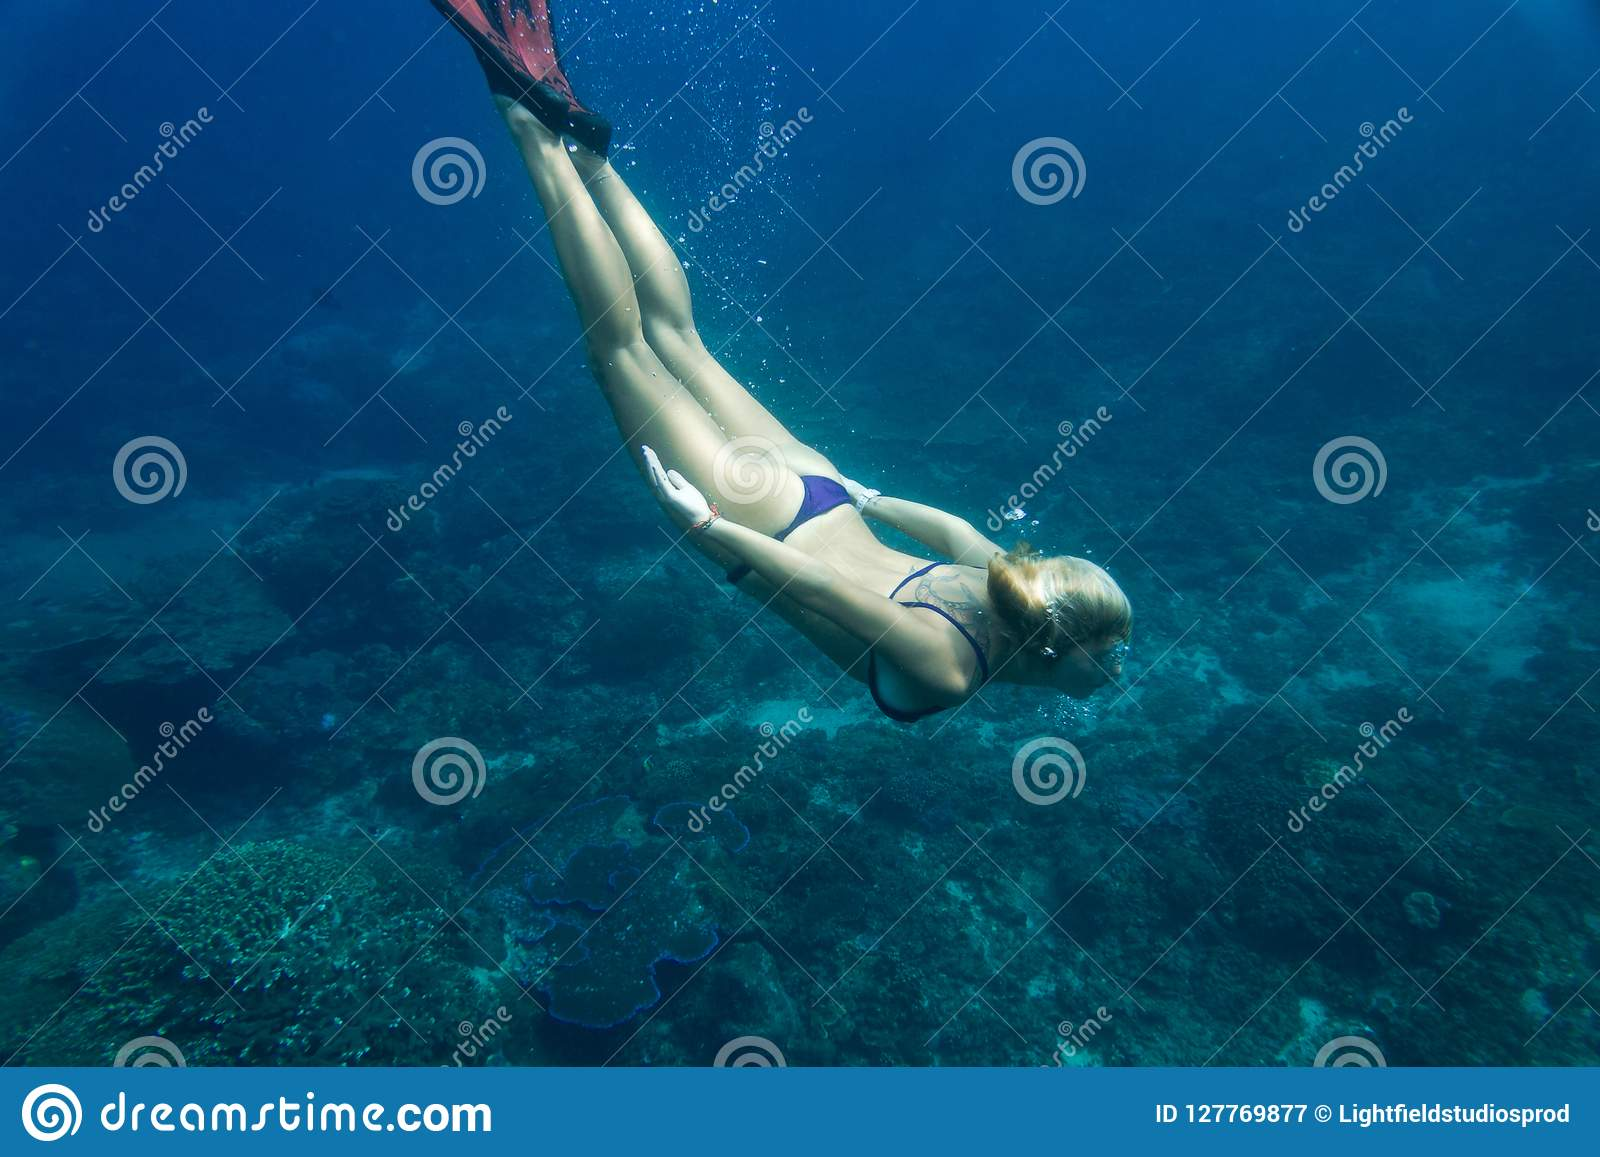 1001Archives: Zena Holloway - Wet Dreams (Underwater